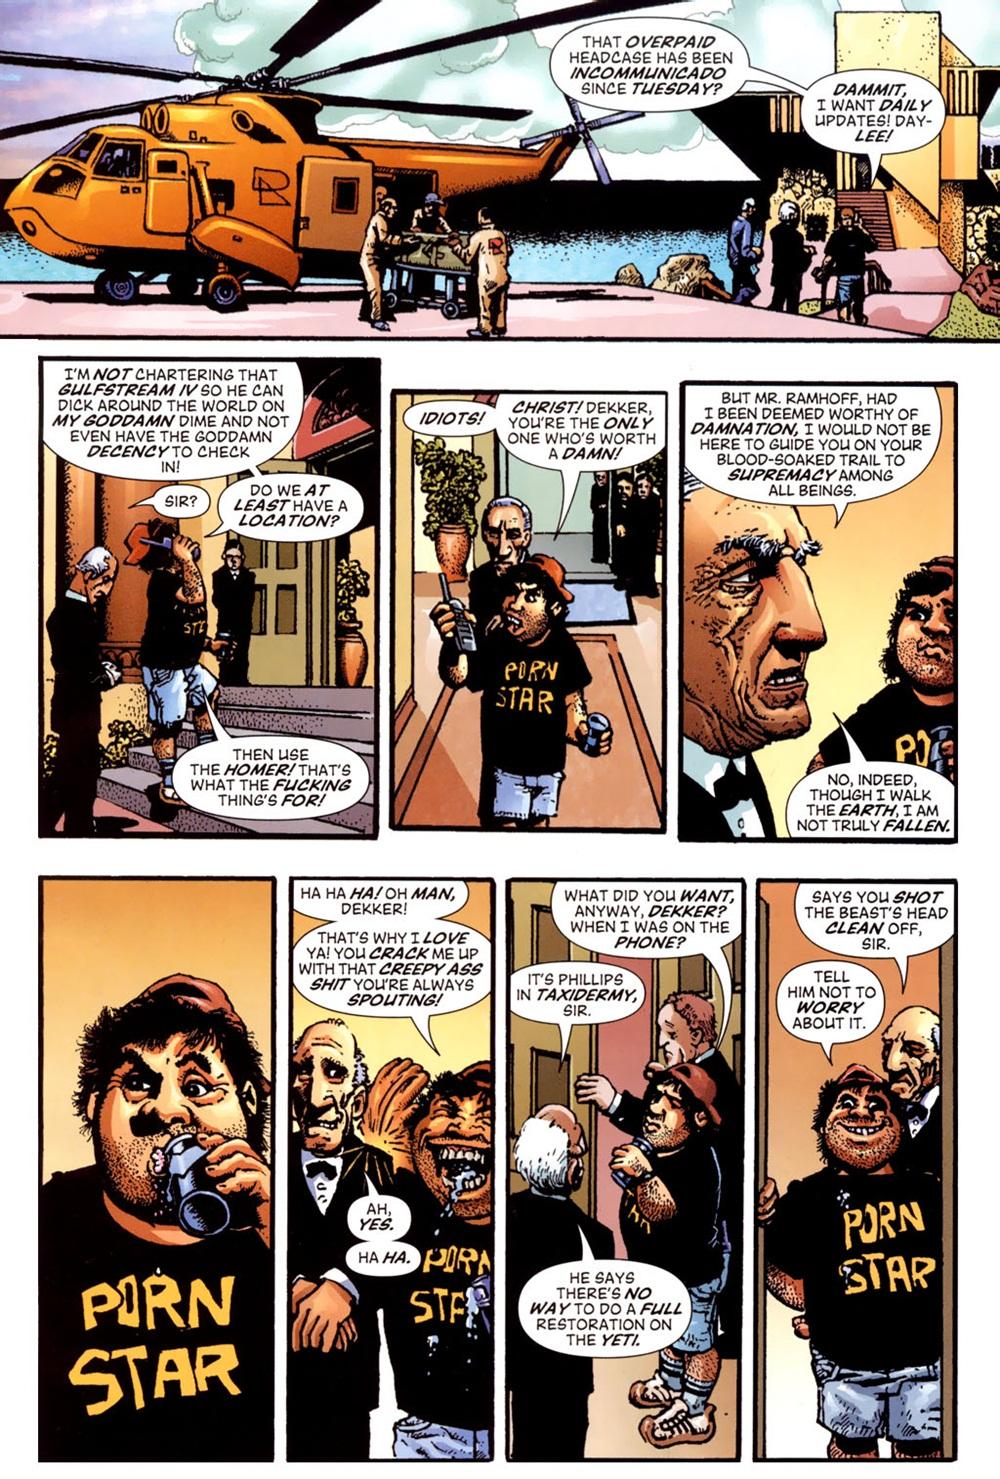 Swamp Thing v4 007   Vietcomic.net reading comics online for free